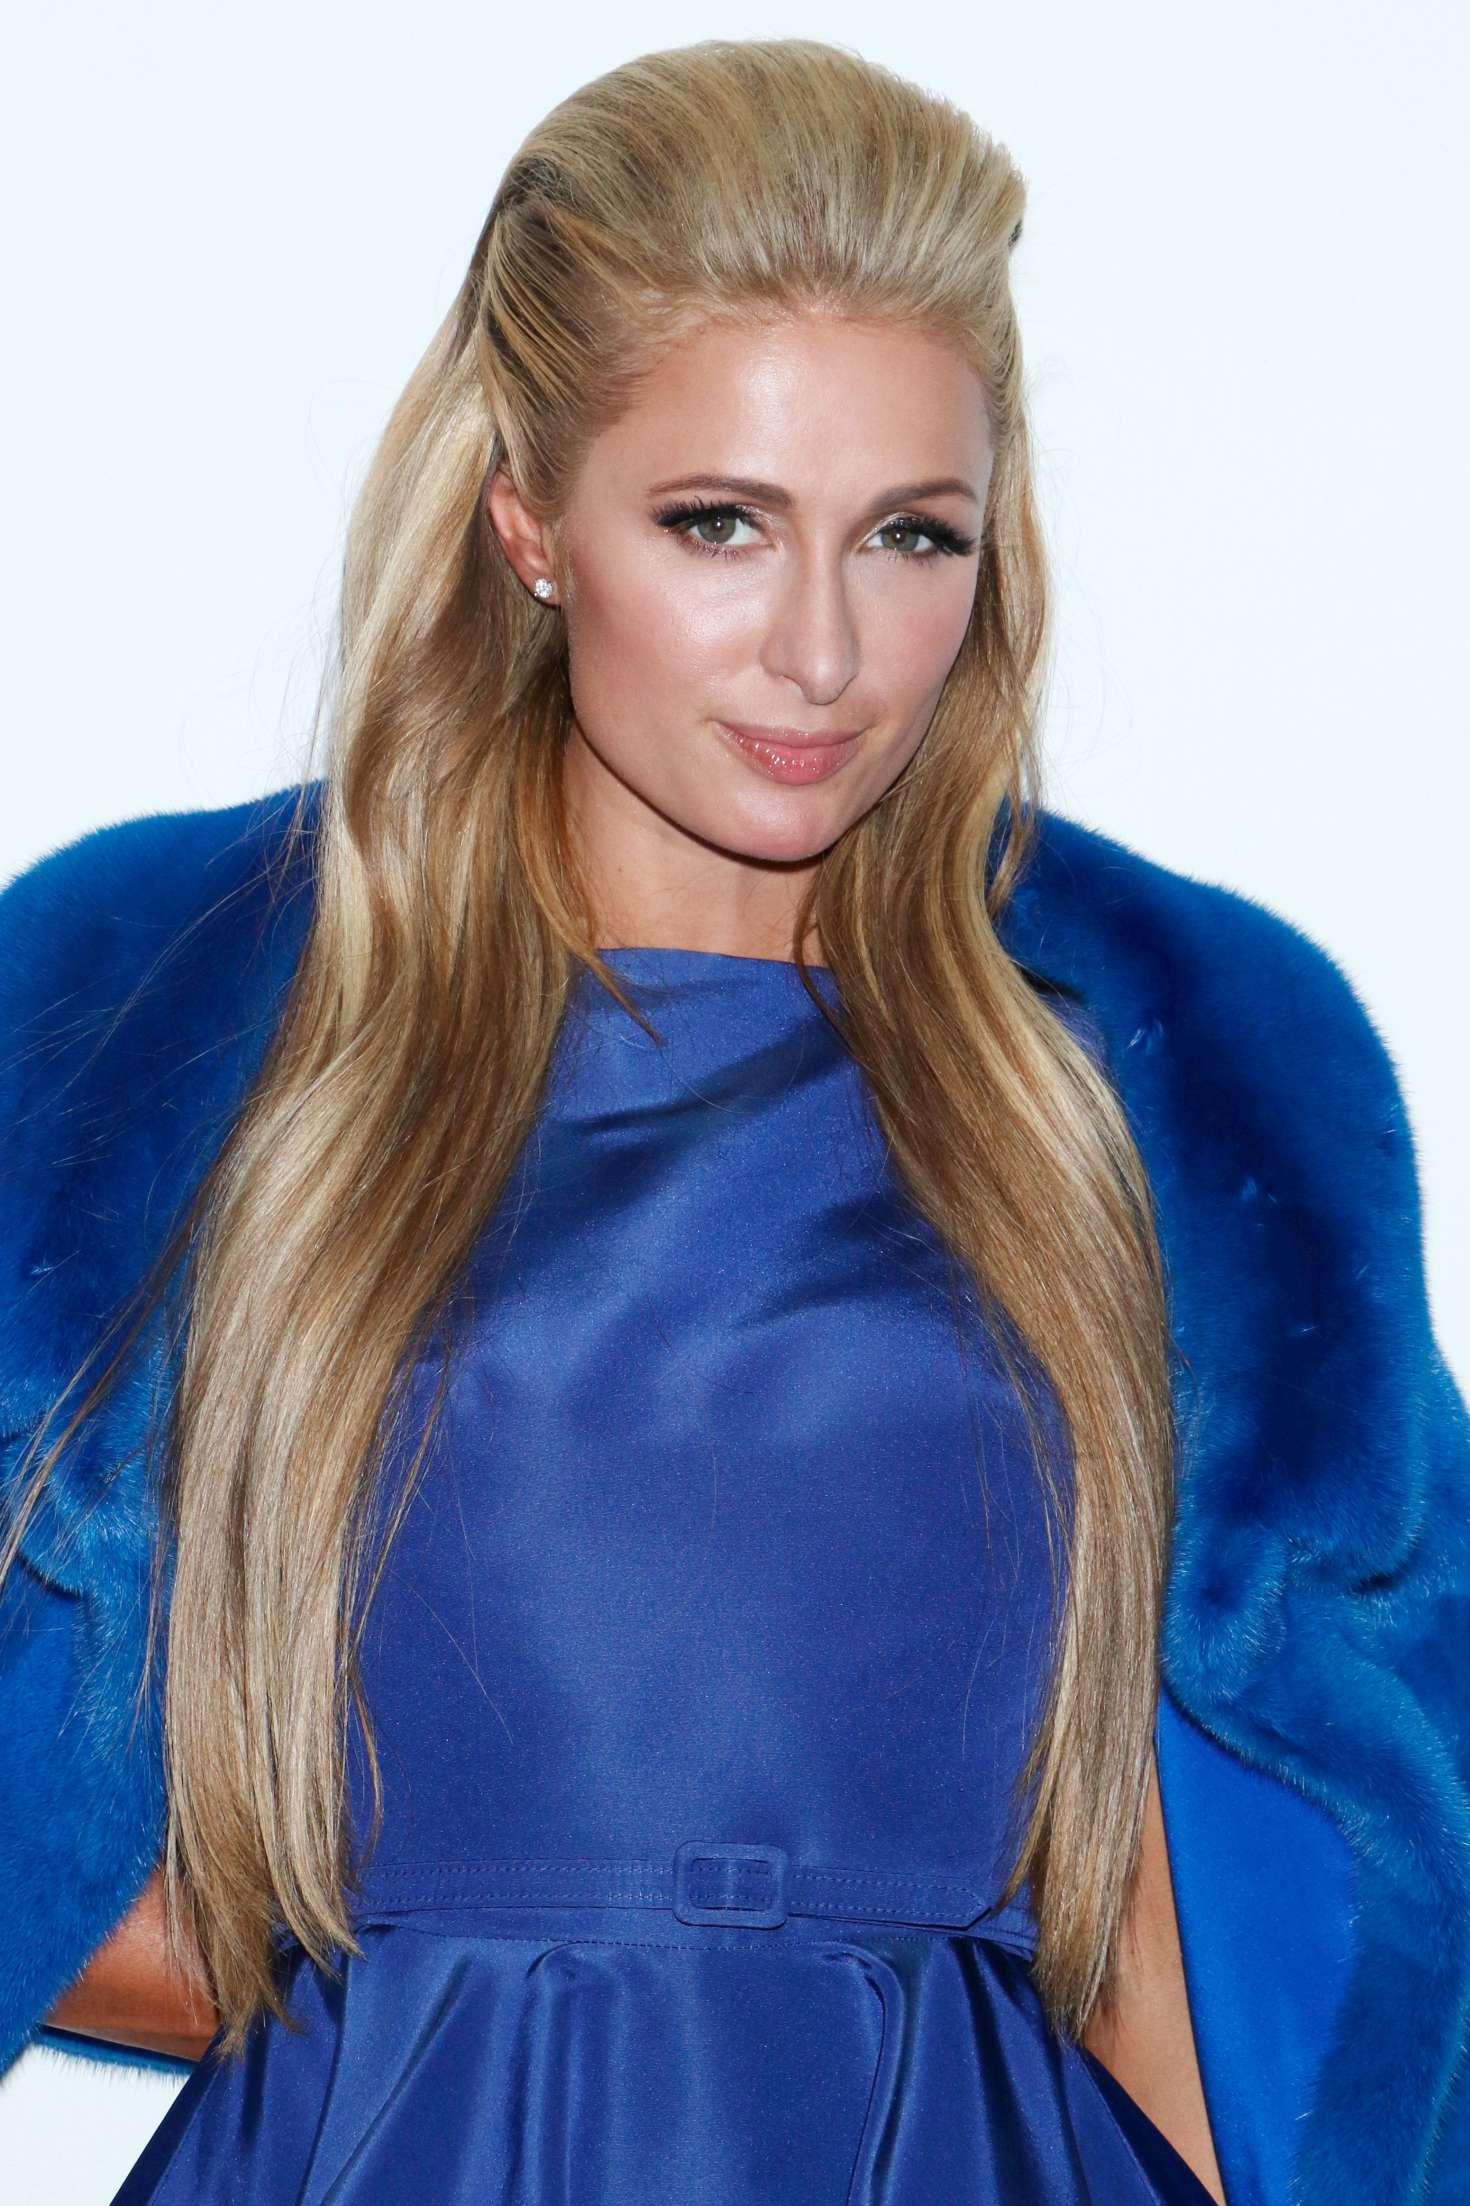 Paris Hilton nudes (51 fotos), photos Erotica, Twitter, legs 2015